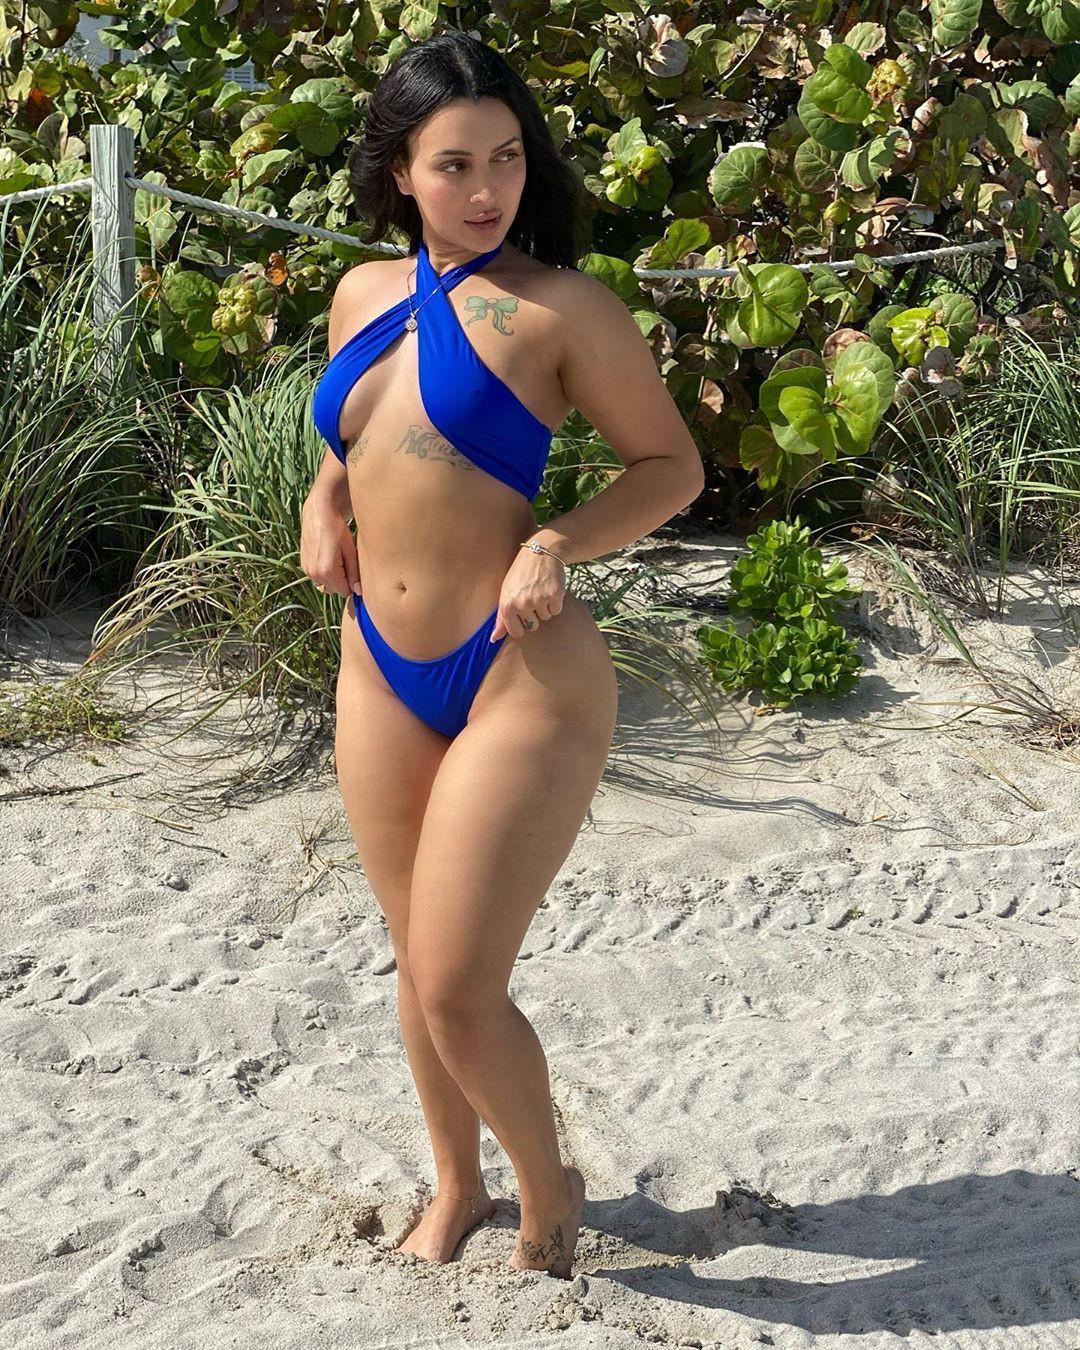 Nebby Fusco bikini swimwear trendy clothing ideas, hot thighs